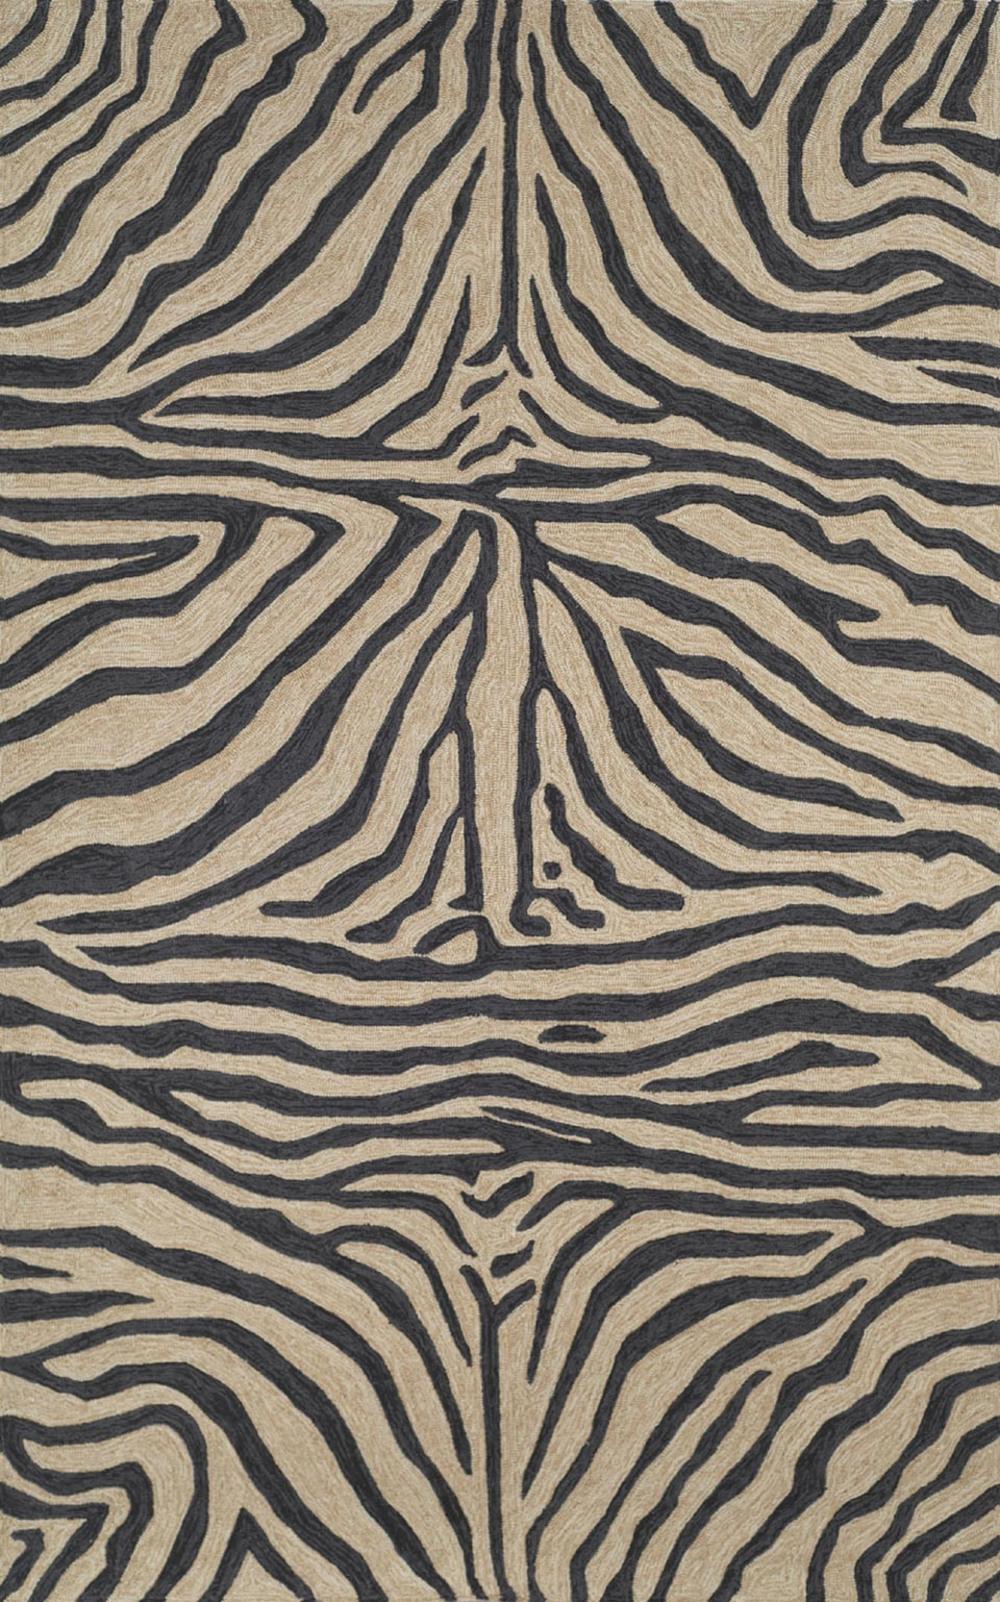 Trans-Ocean Import - Ravella Zebra Black Rug, 5'x8'